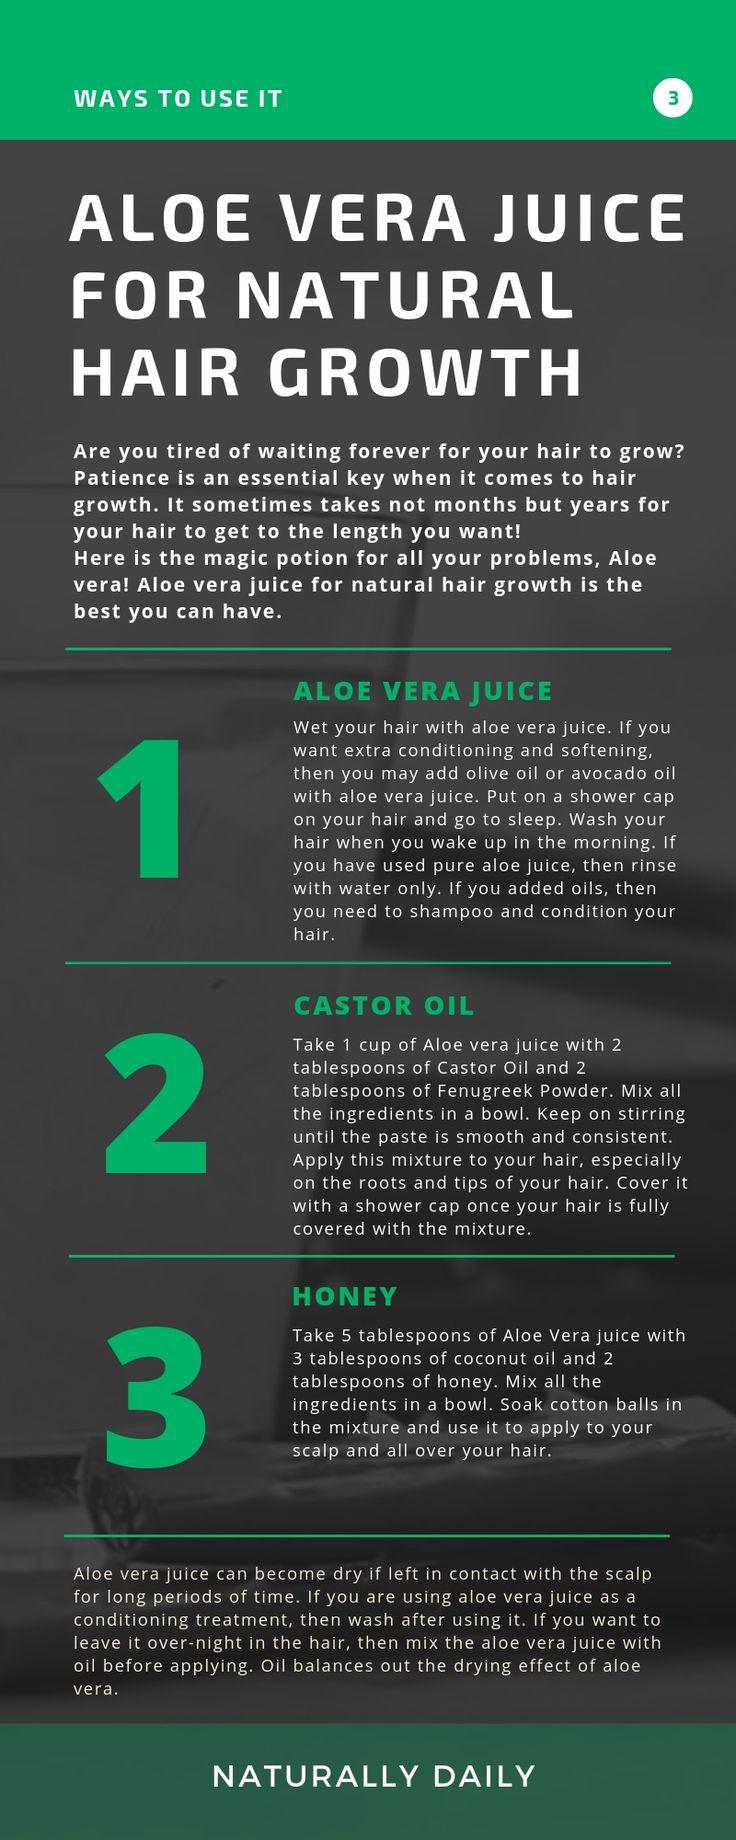 Aloe Vera Juice for Pure Hair Progress